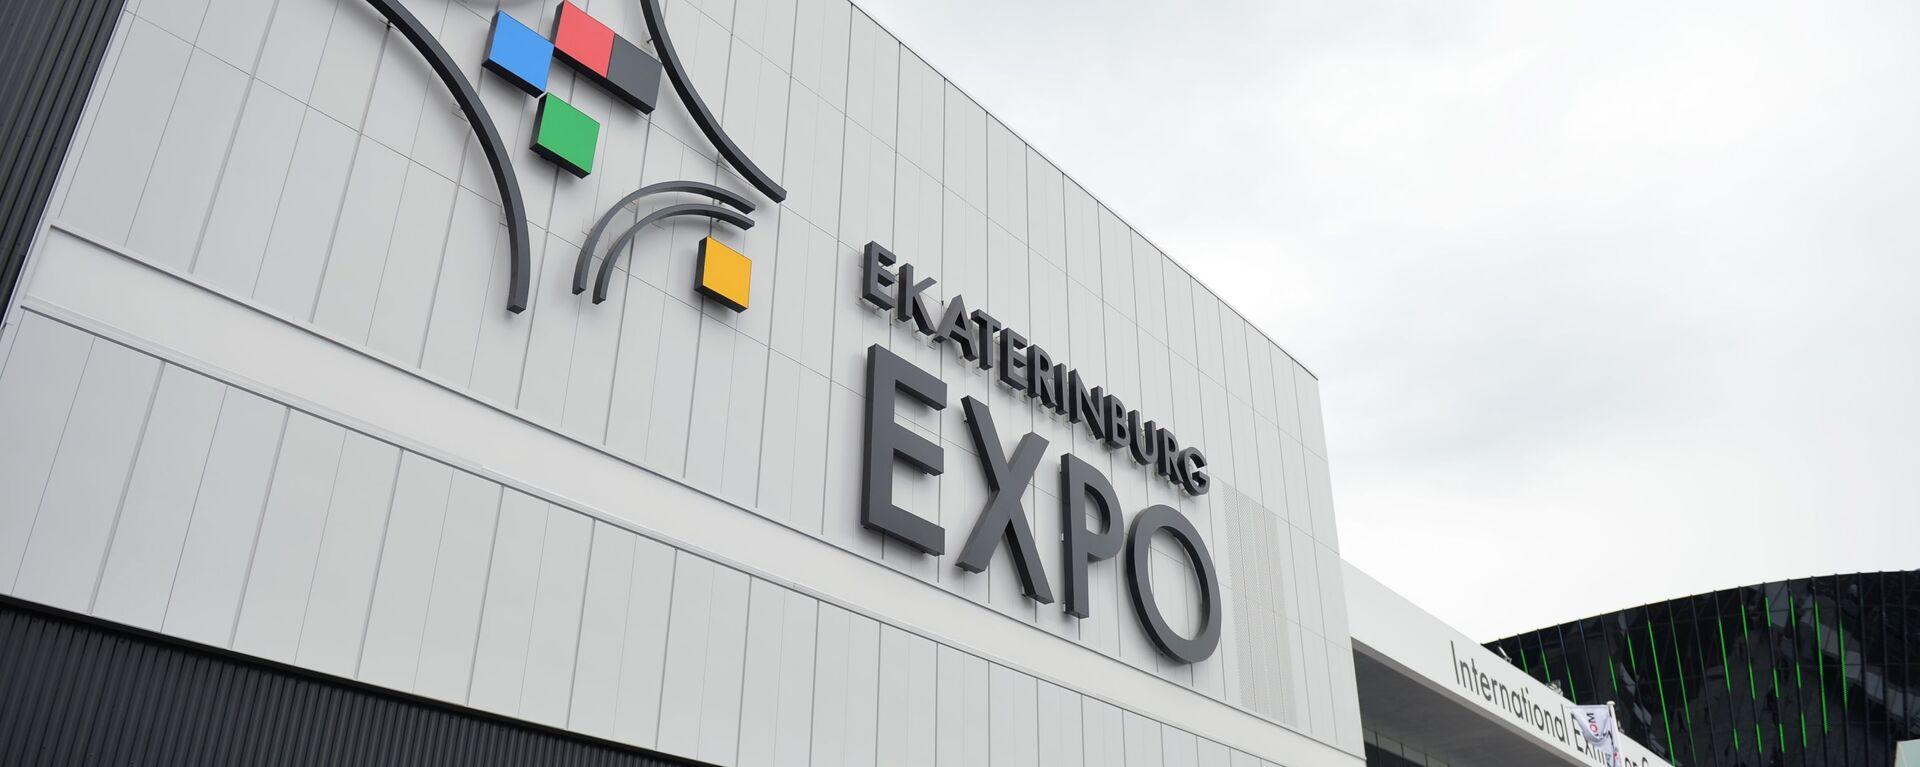 Ekaterinburg-EXPO - Sputnik Italia, 1920, 03.07.2021